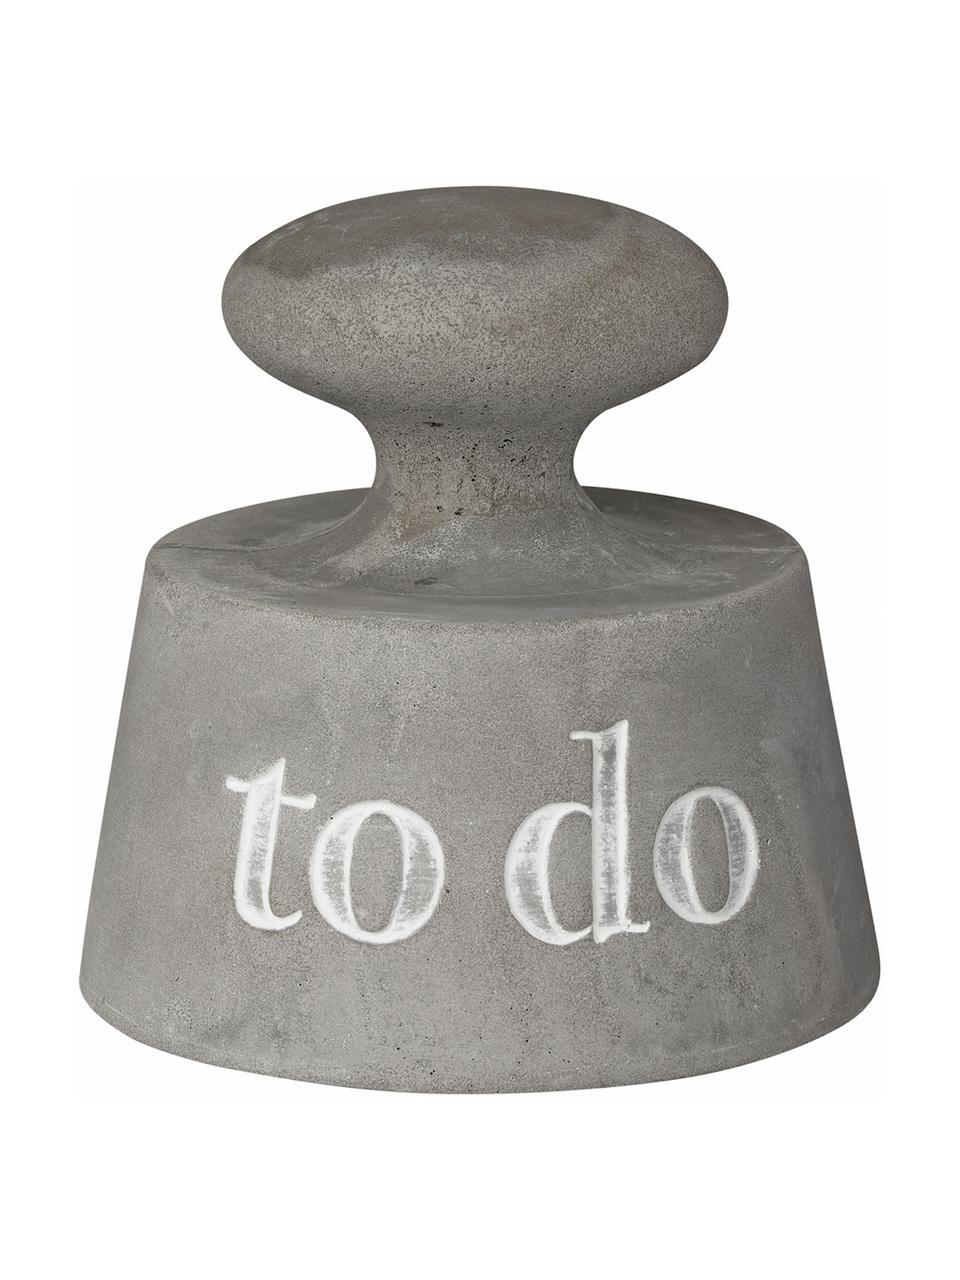 Briefbeschwerer To Do, Beton, Grau, Ø 8 x H 8 cm